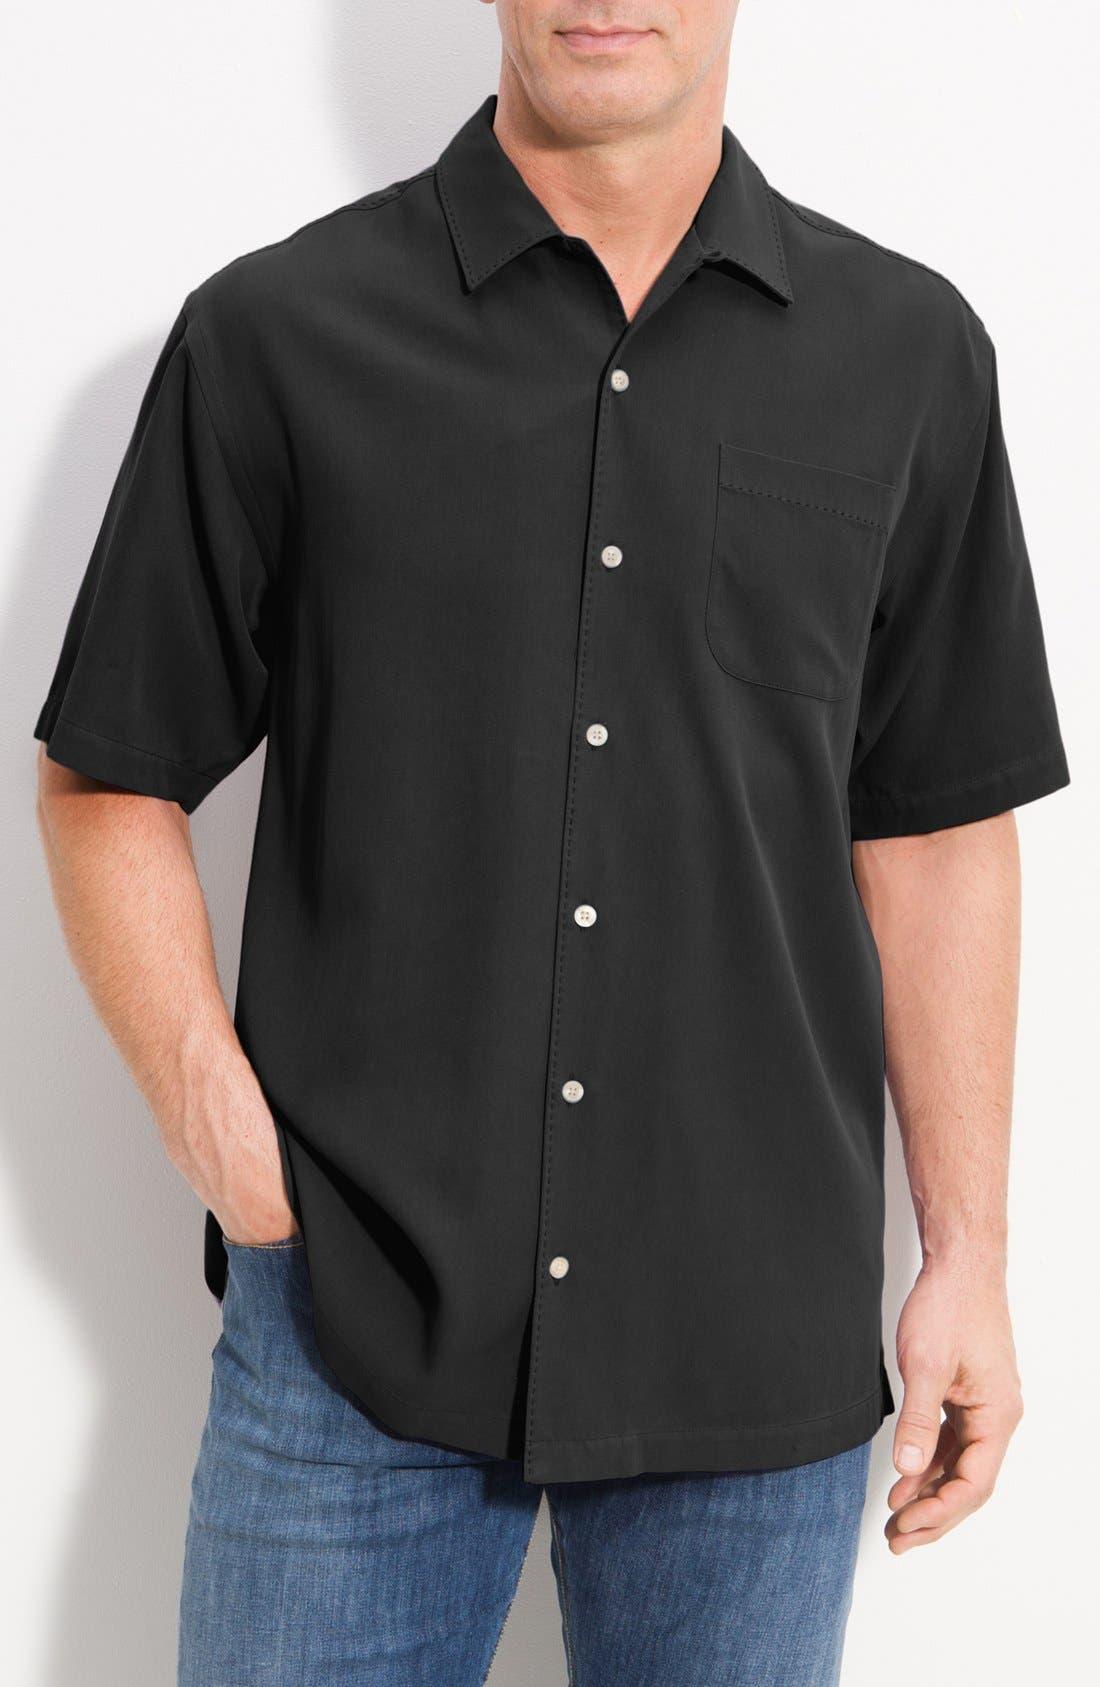 Main Image - Tommy Bahama 'Catalina Twill' Island Modern Fit Silk Campshirt